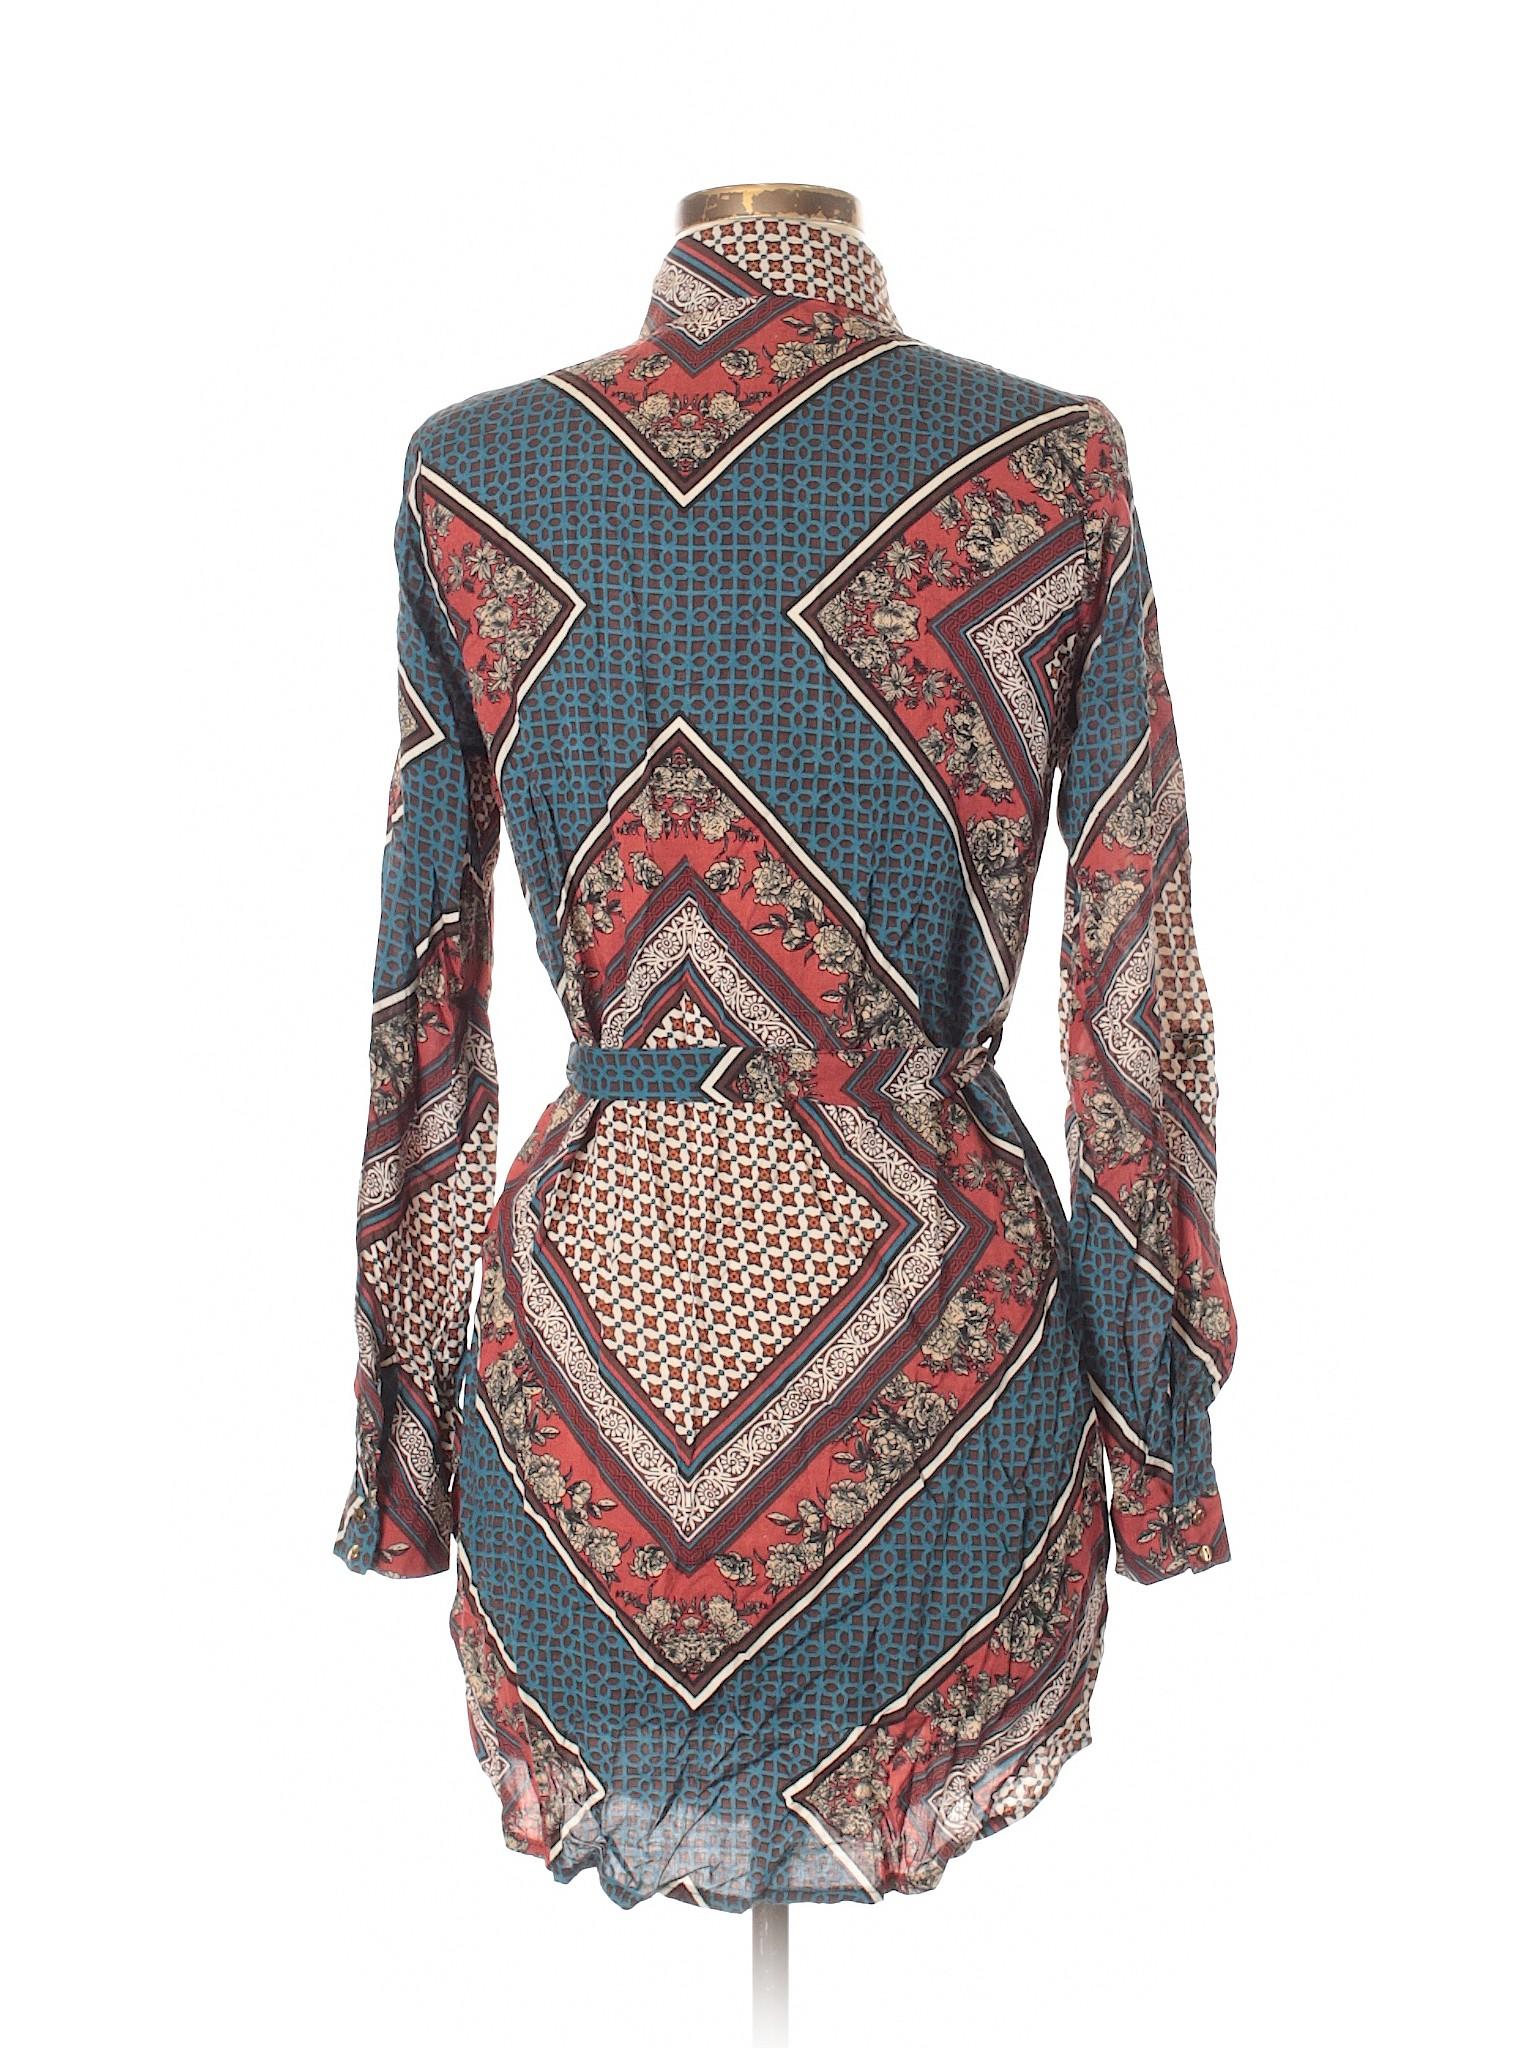 Boohoo Boutique Casual Boutique Dress winter 45qr5xzP